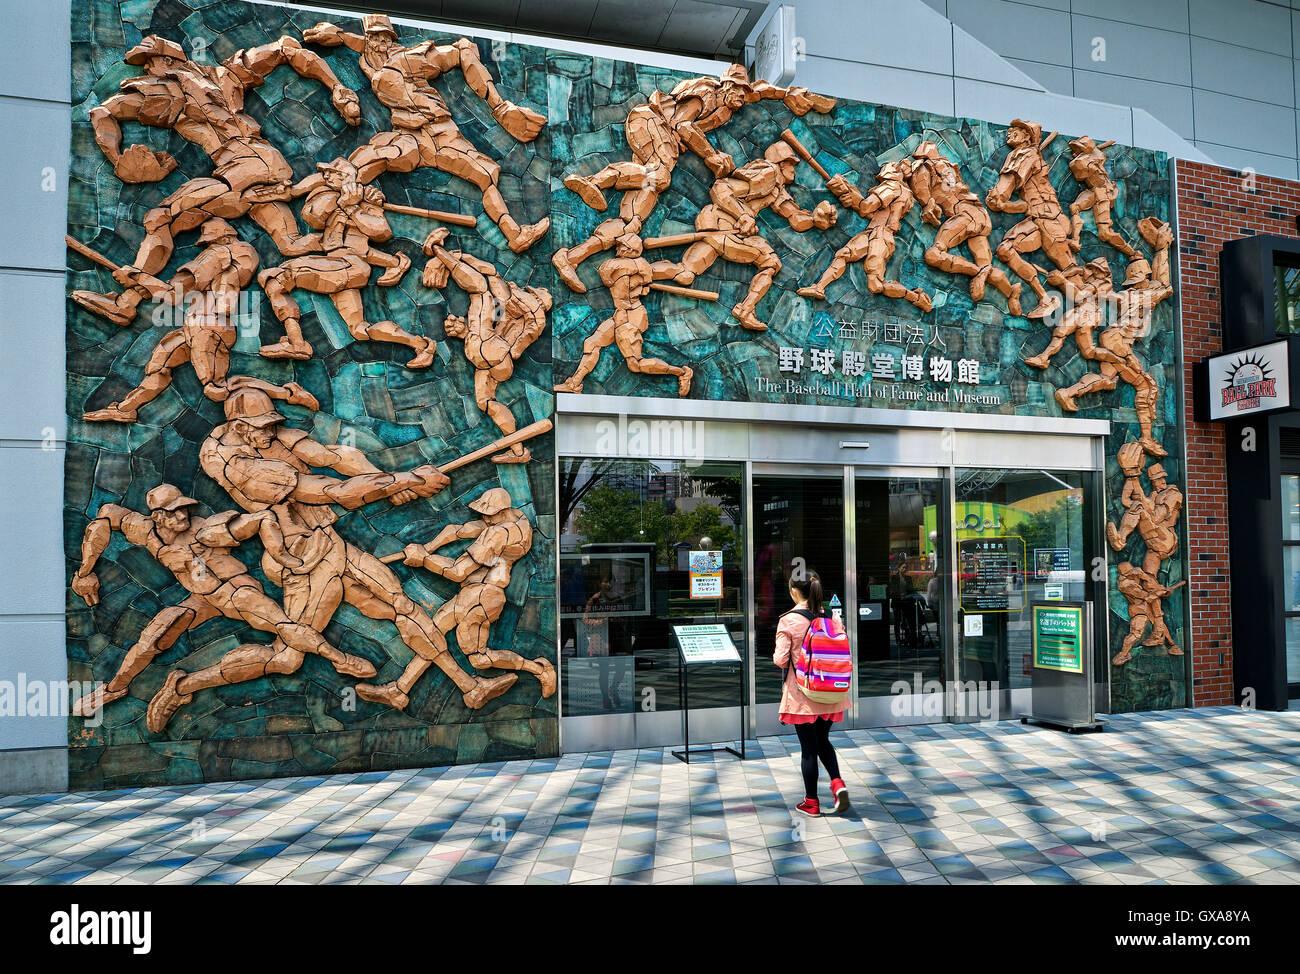 L'île de Honshu, Japon, Tokyo, Kanto, baseball musée au Tokyo Dome. Photo Stock